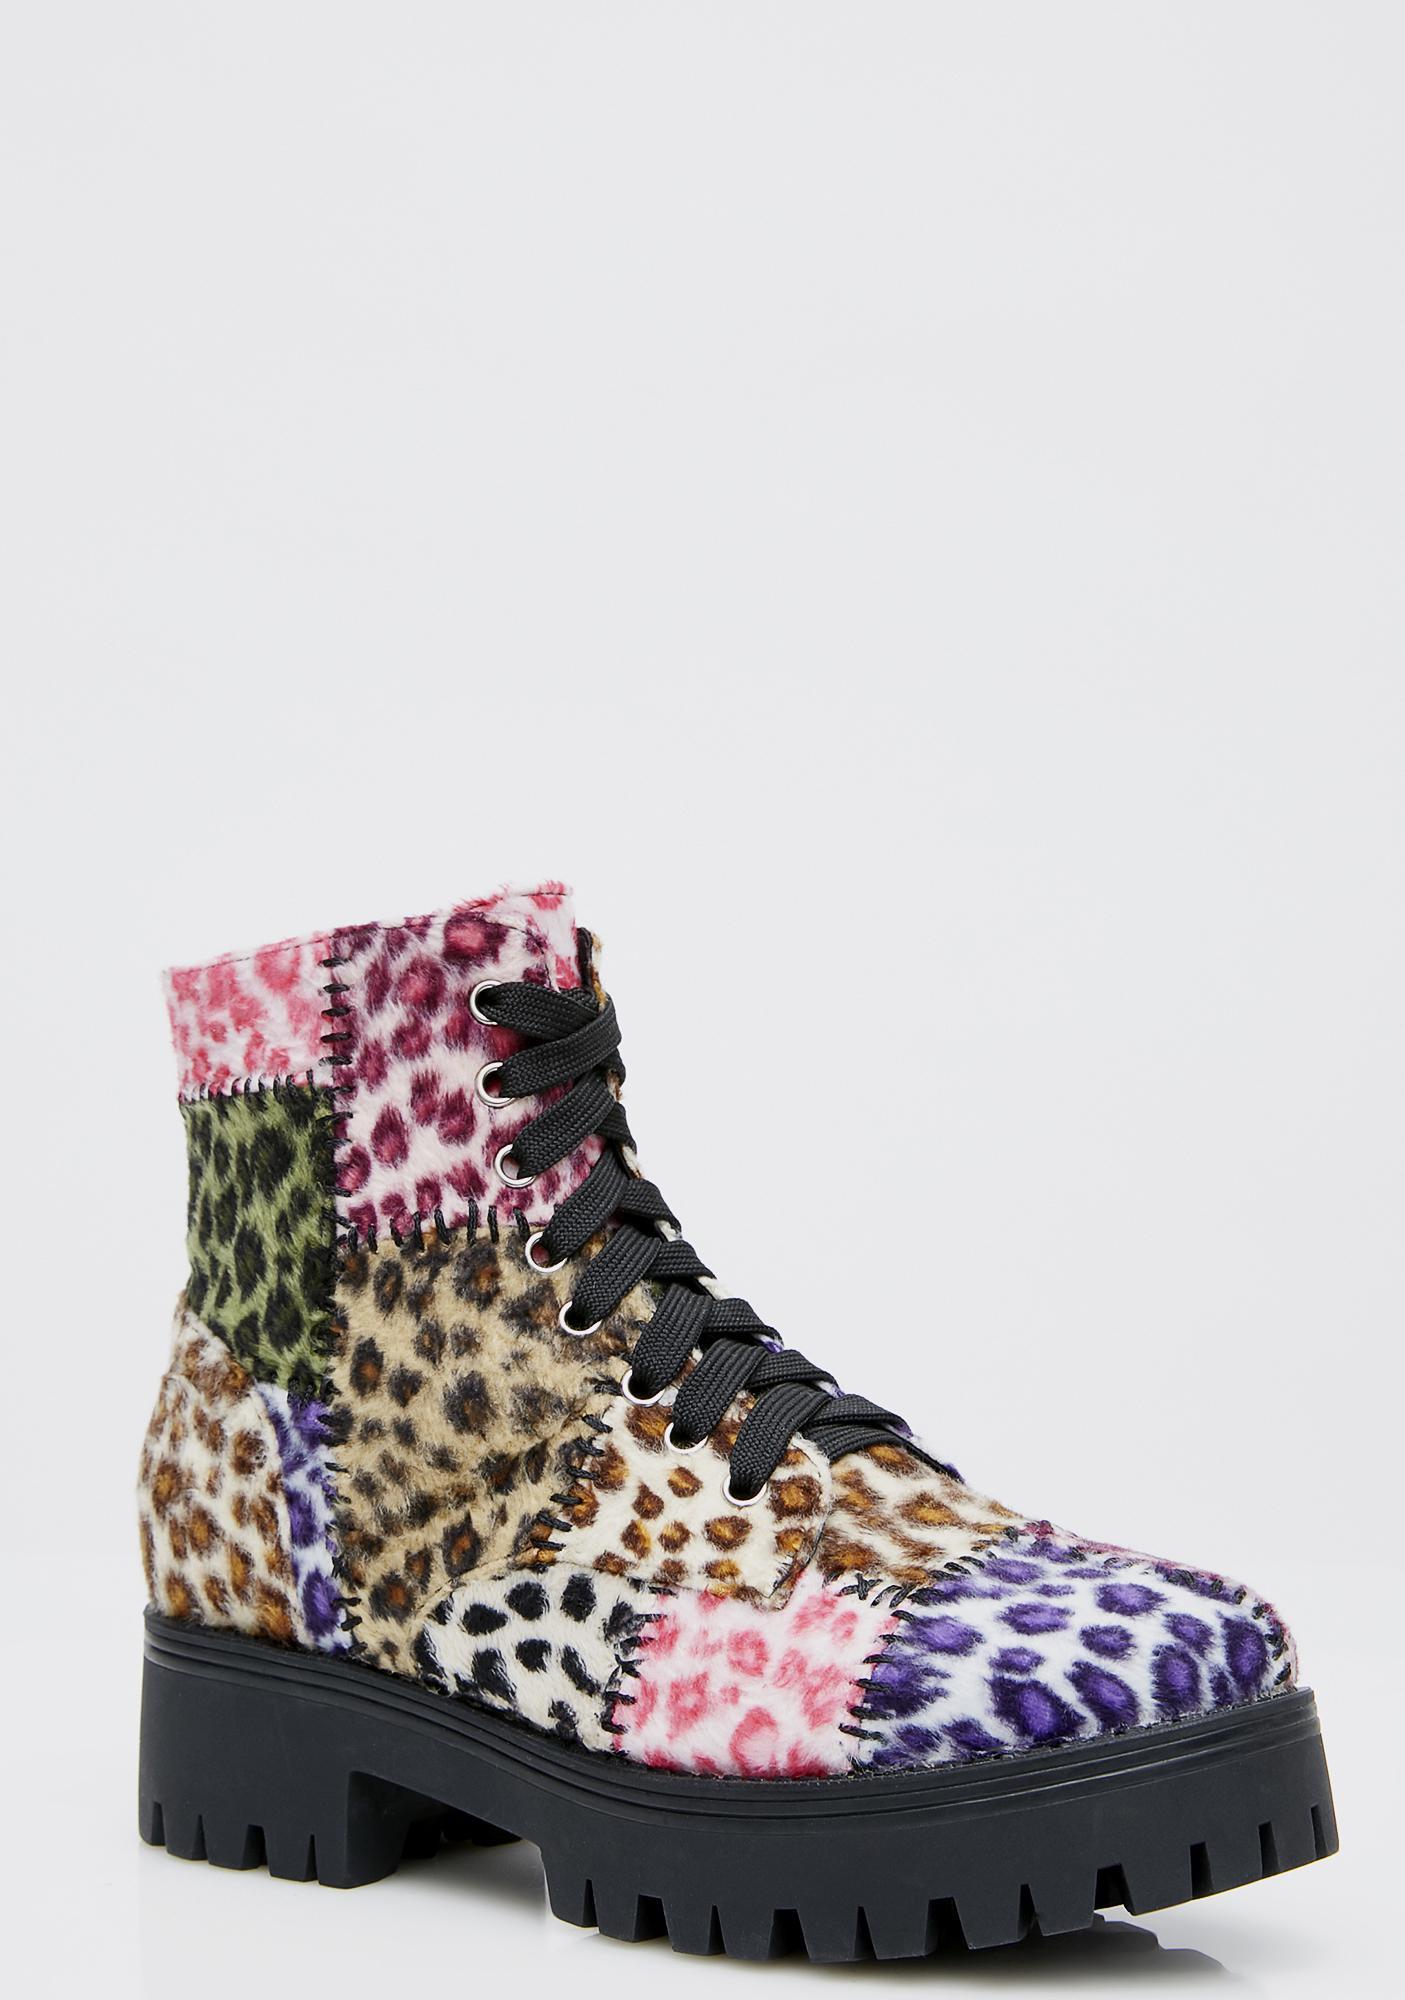 Current Mood Leopard Junkyard Boots